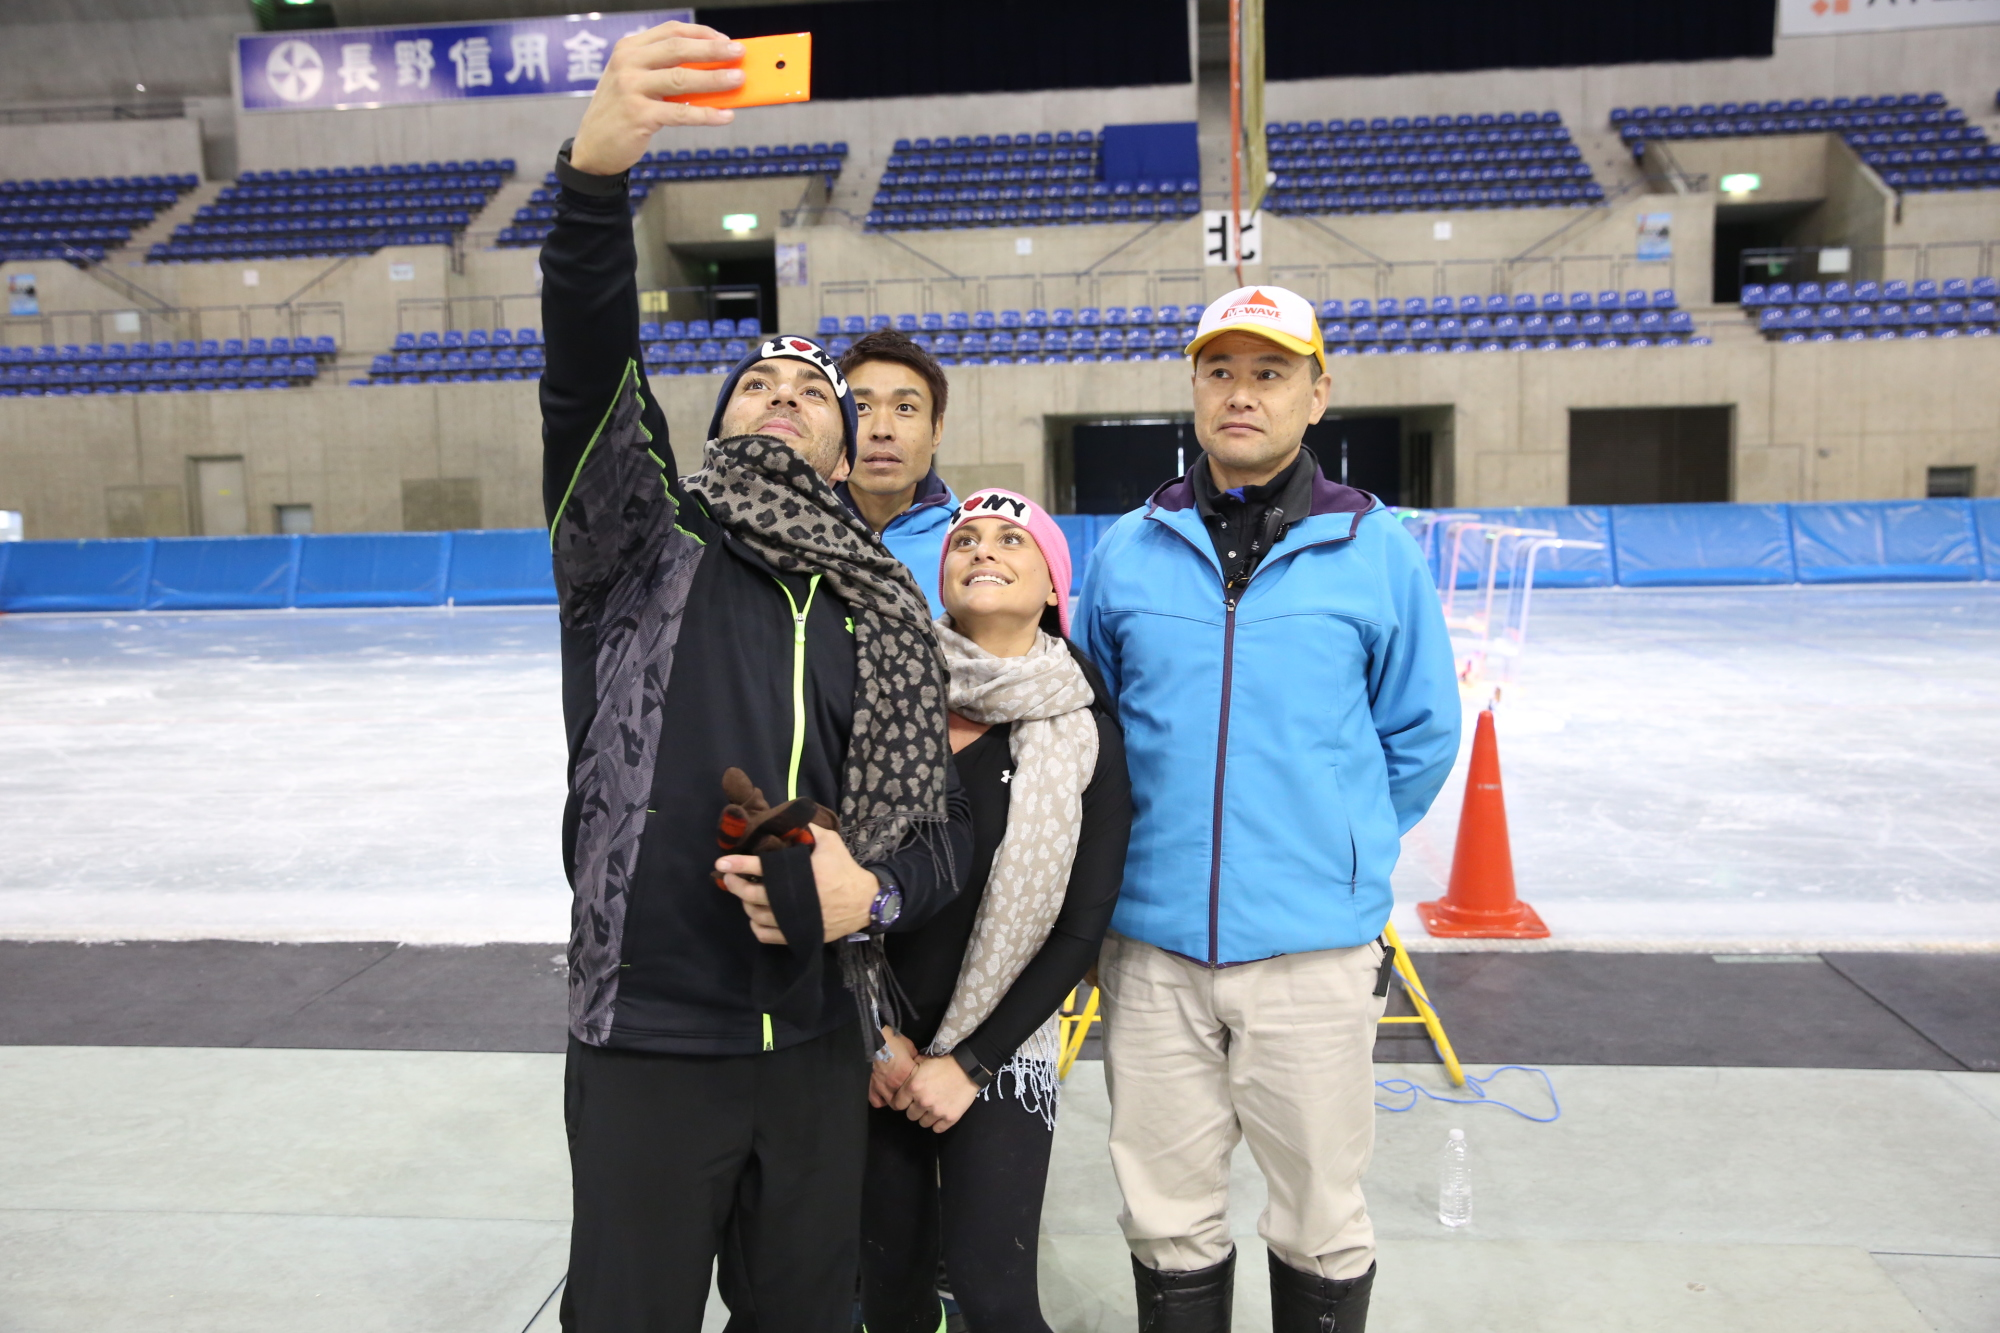 Selfies and skates